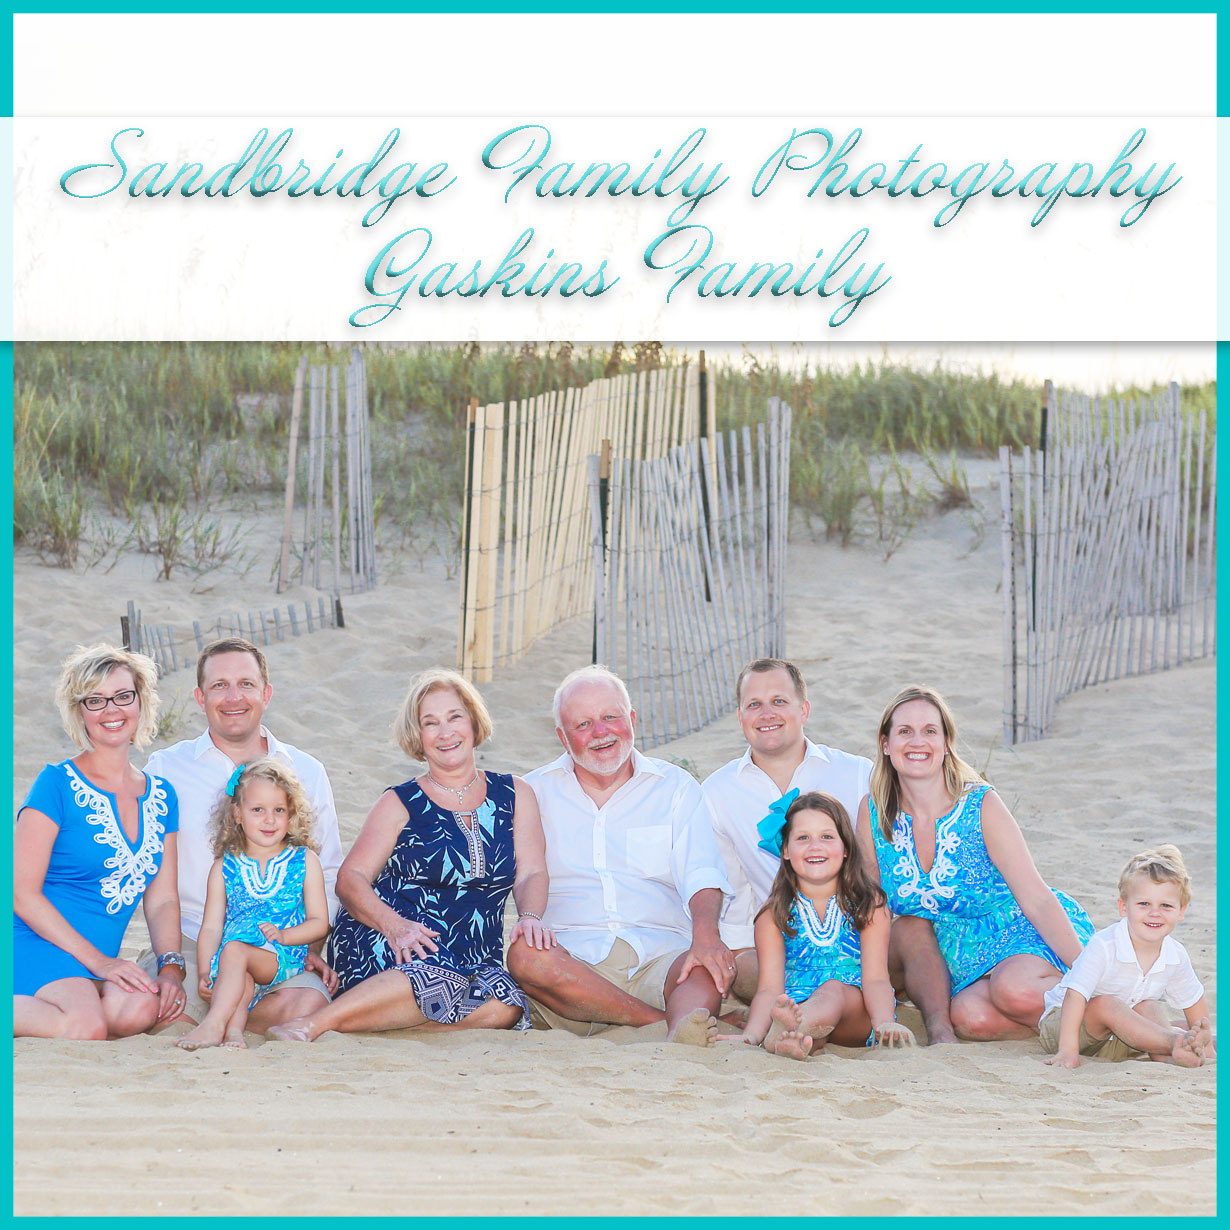 Sandbridge Family Photography